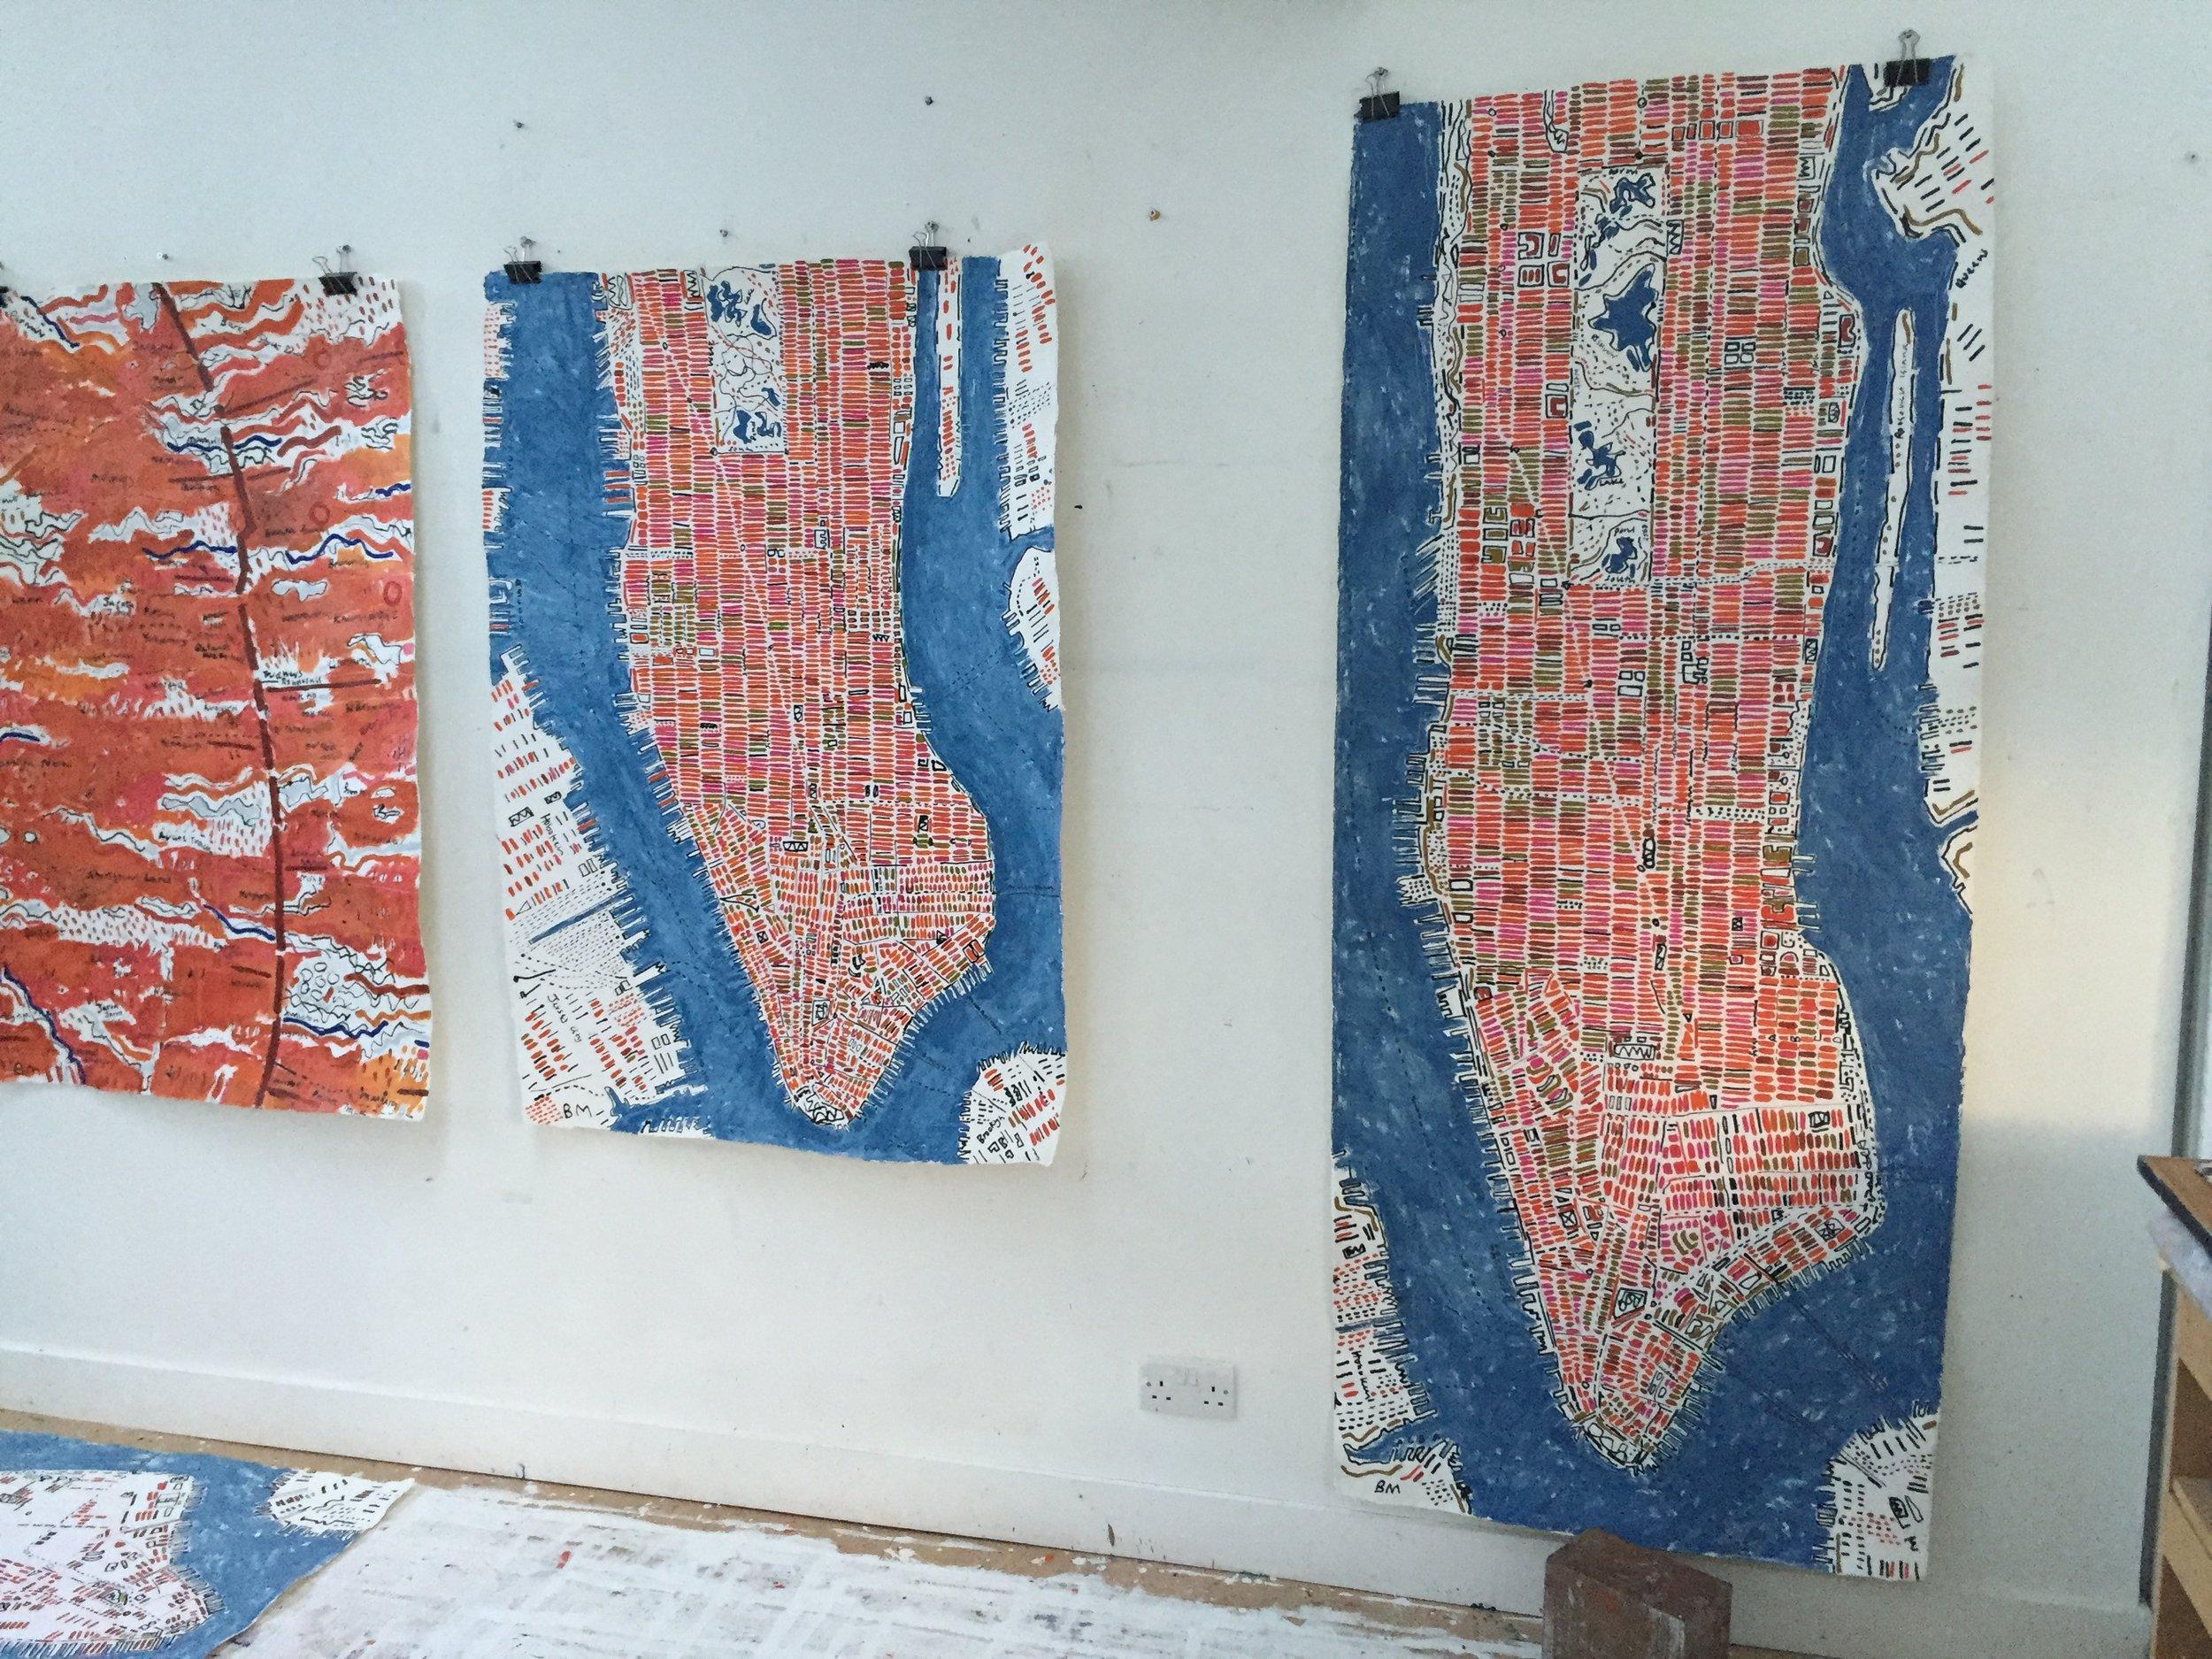 Barbara Macfarlane_Manhattans drying in the studio (2).JPG